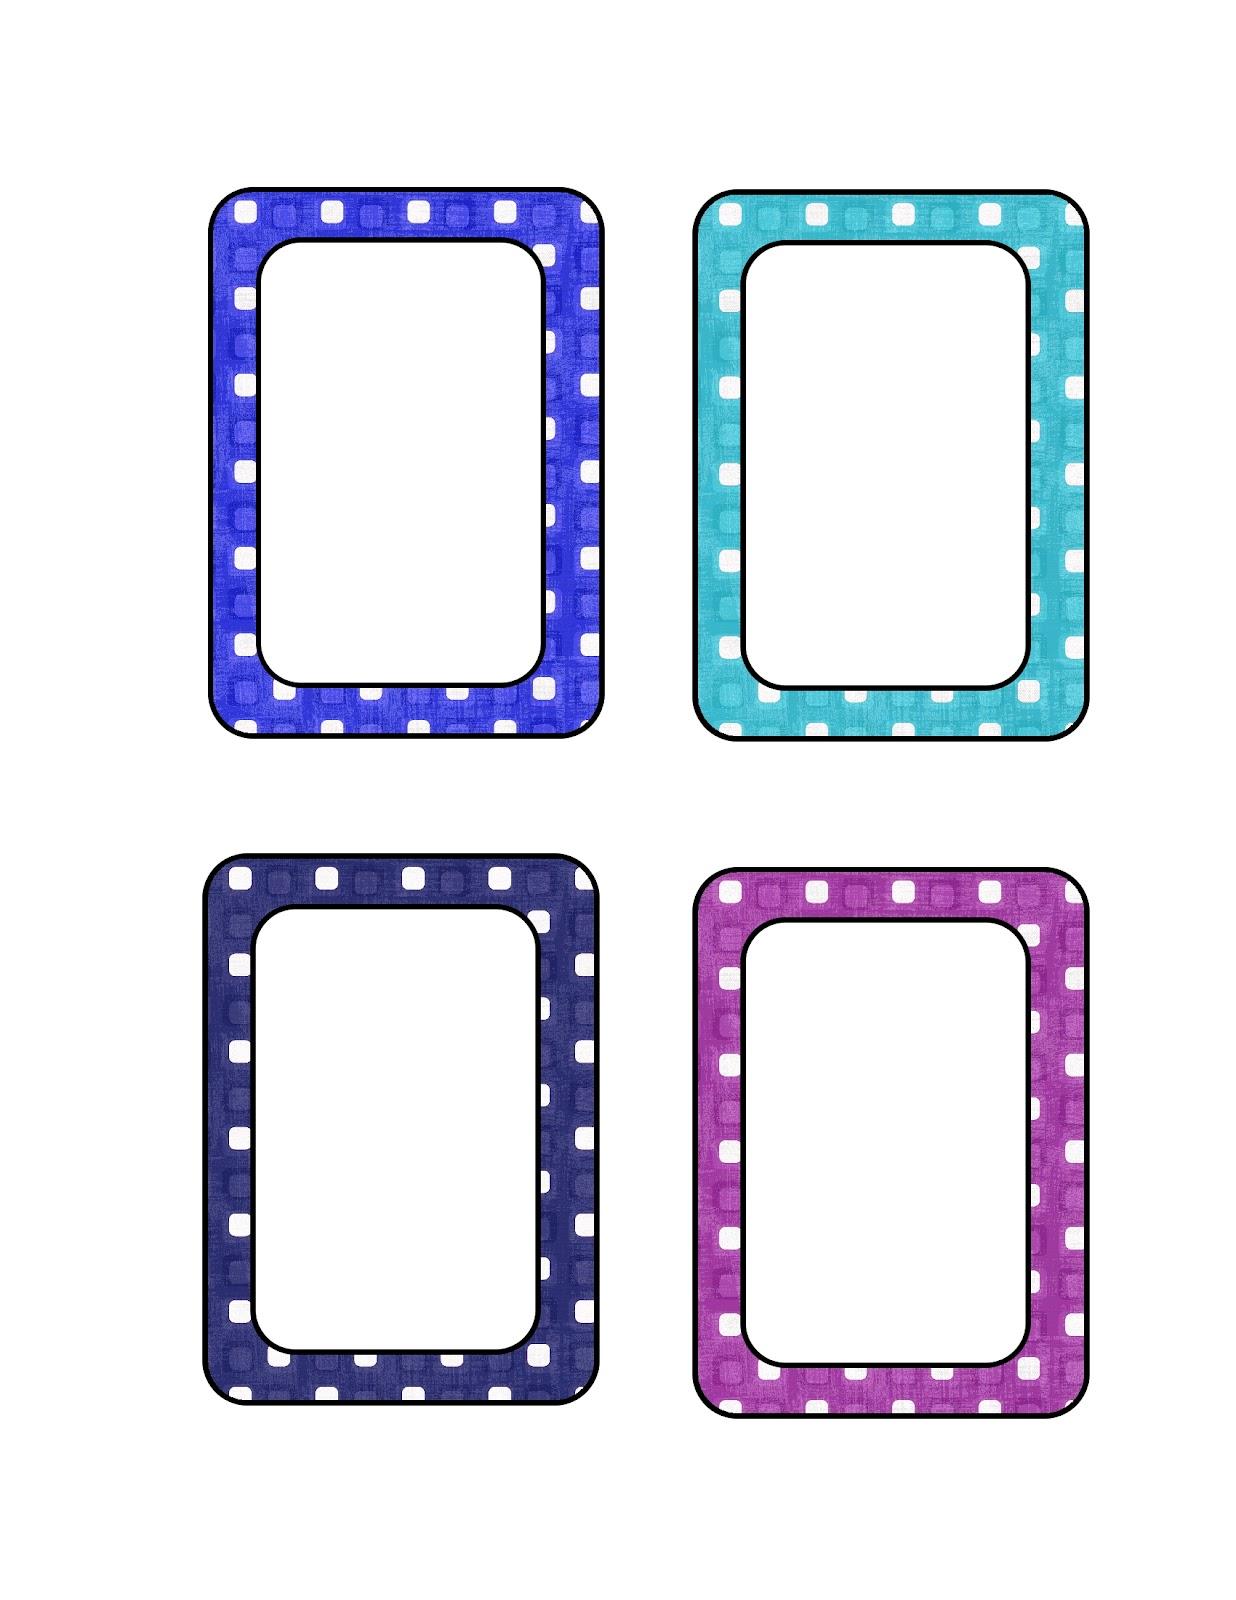 Free clipart name tags image freeuse Free Nametag Cliparts, Download Free Clip Art, Free Clip Art on ... image freeuse